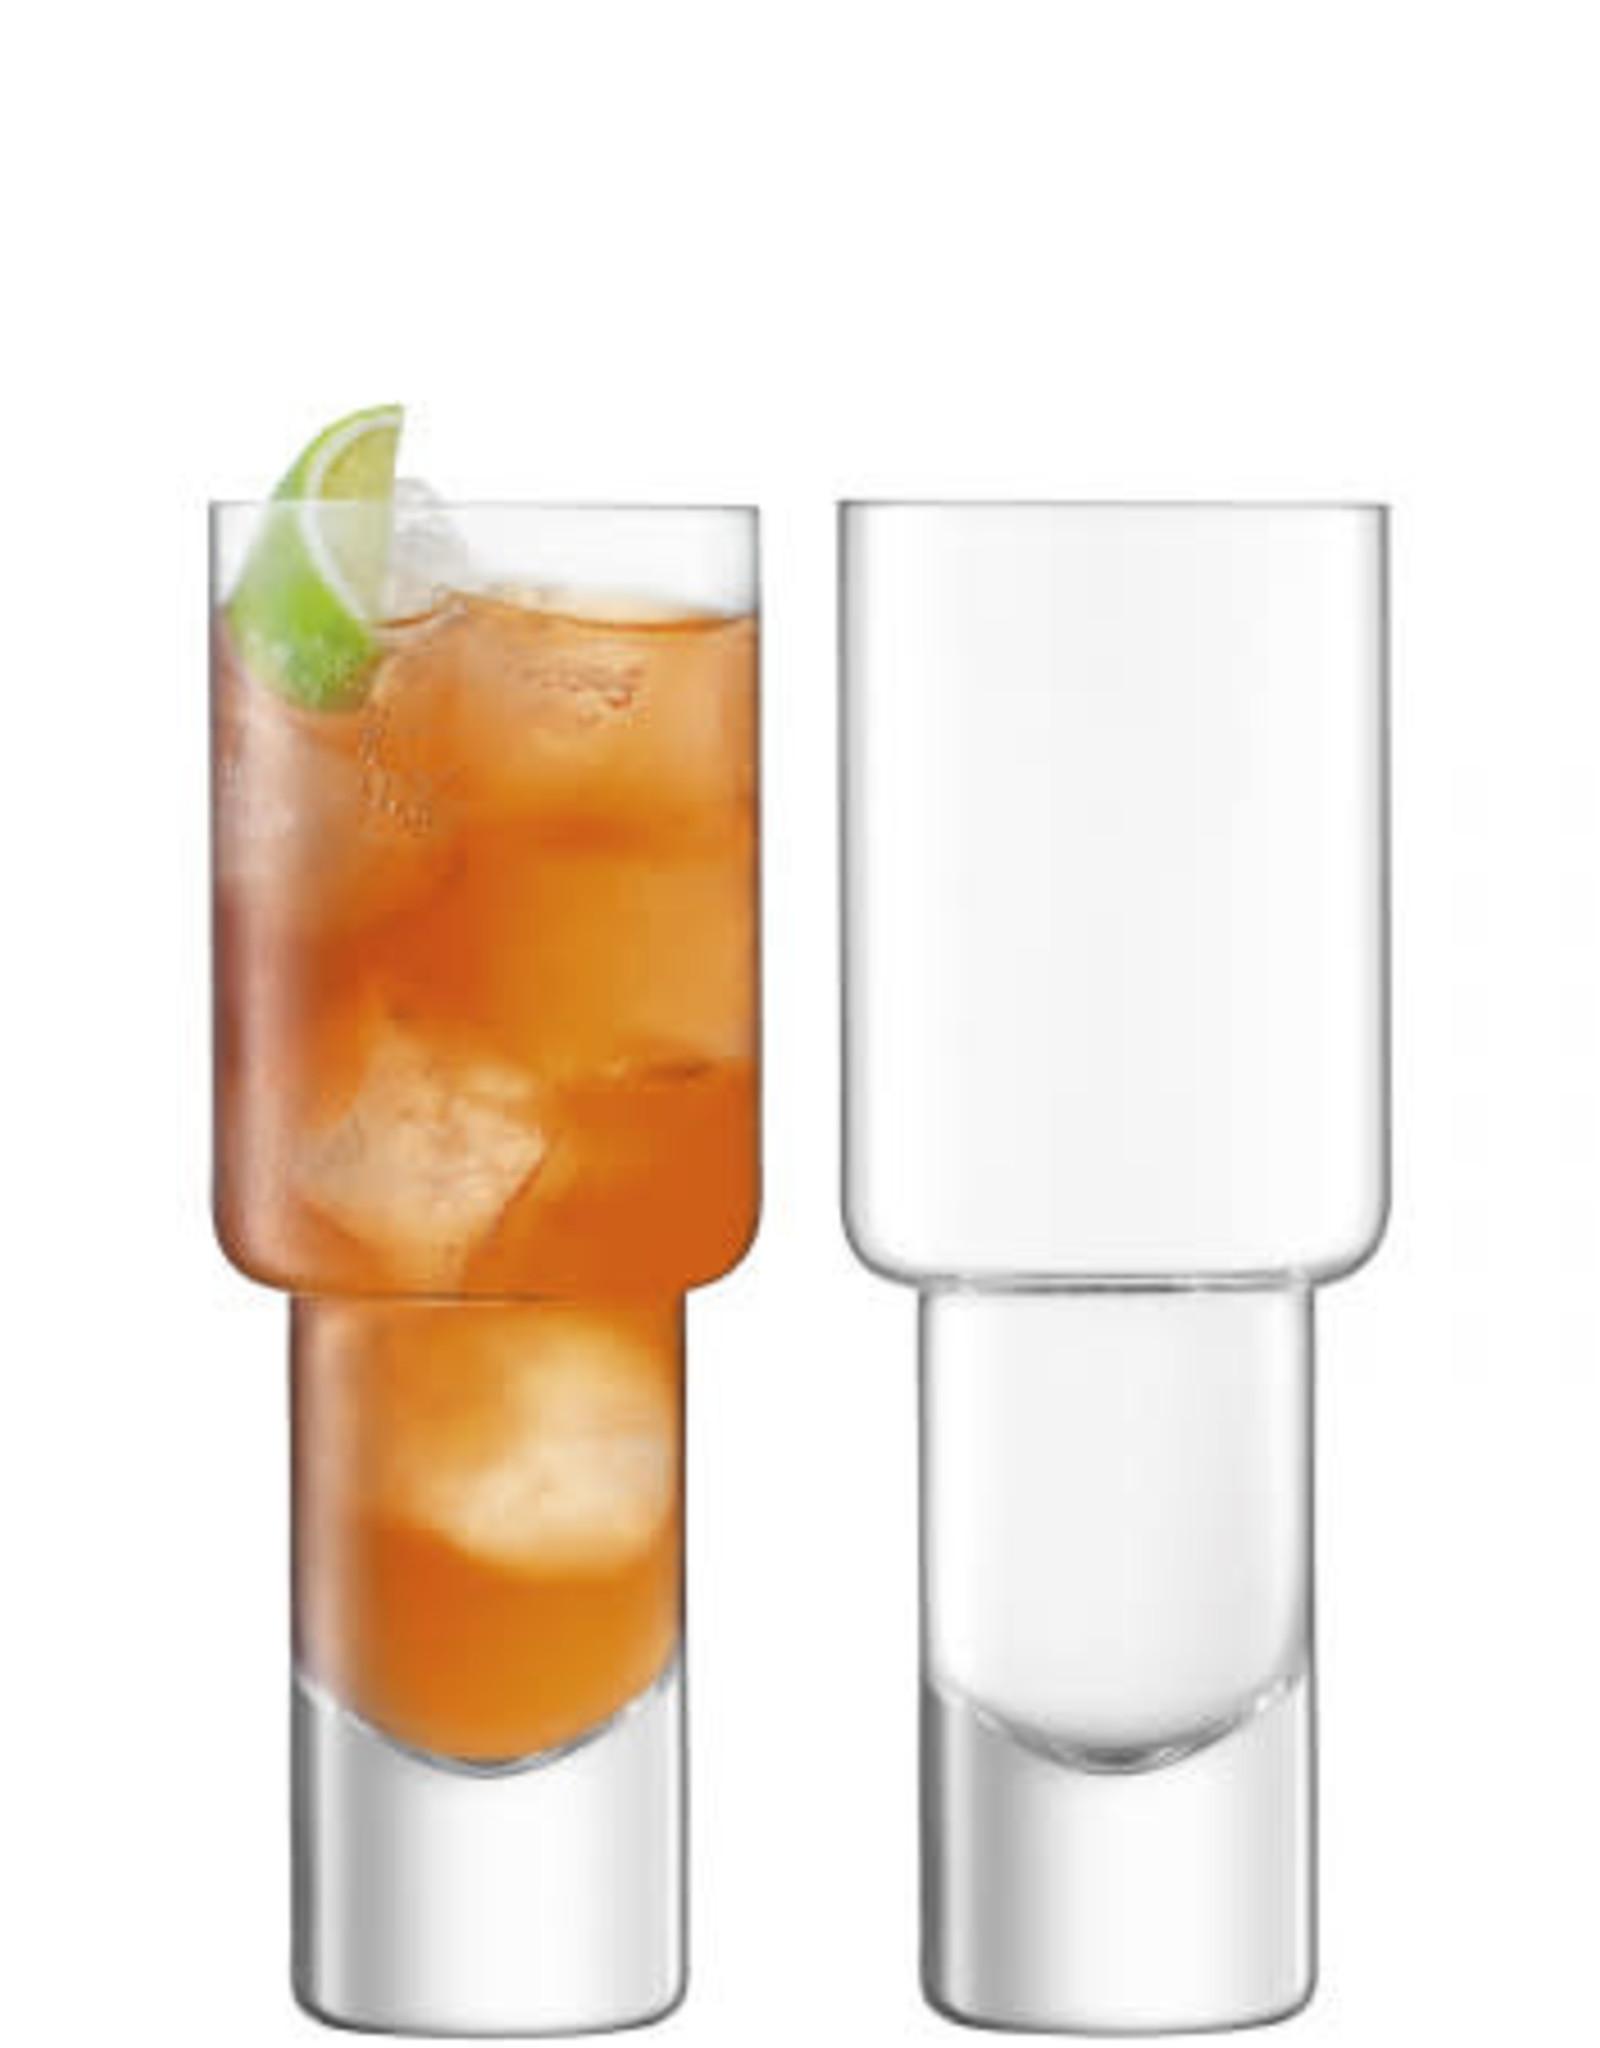 Vodka Mixer Glass 13.5OZ x2